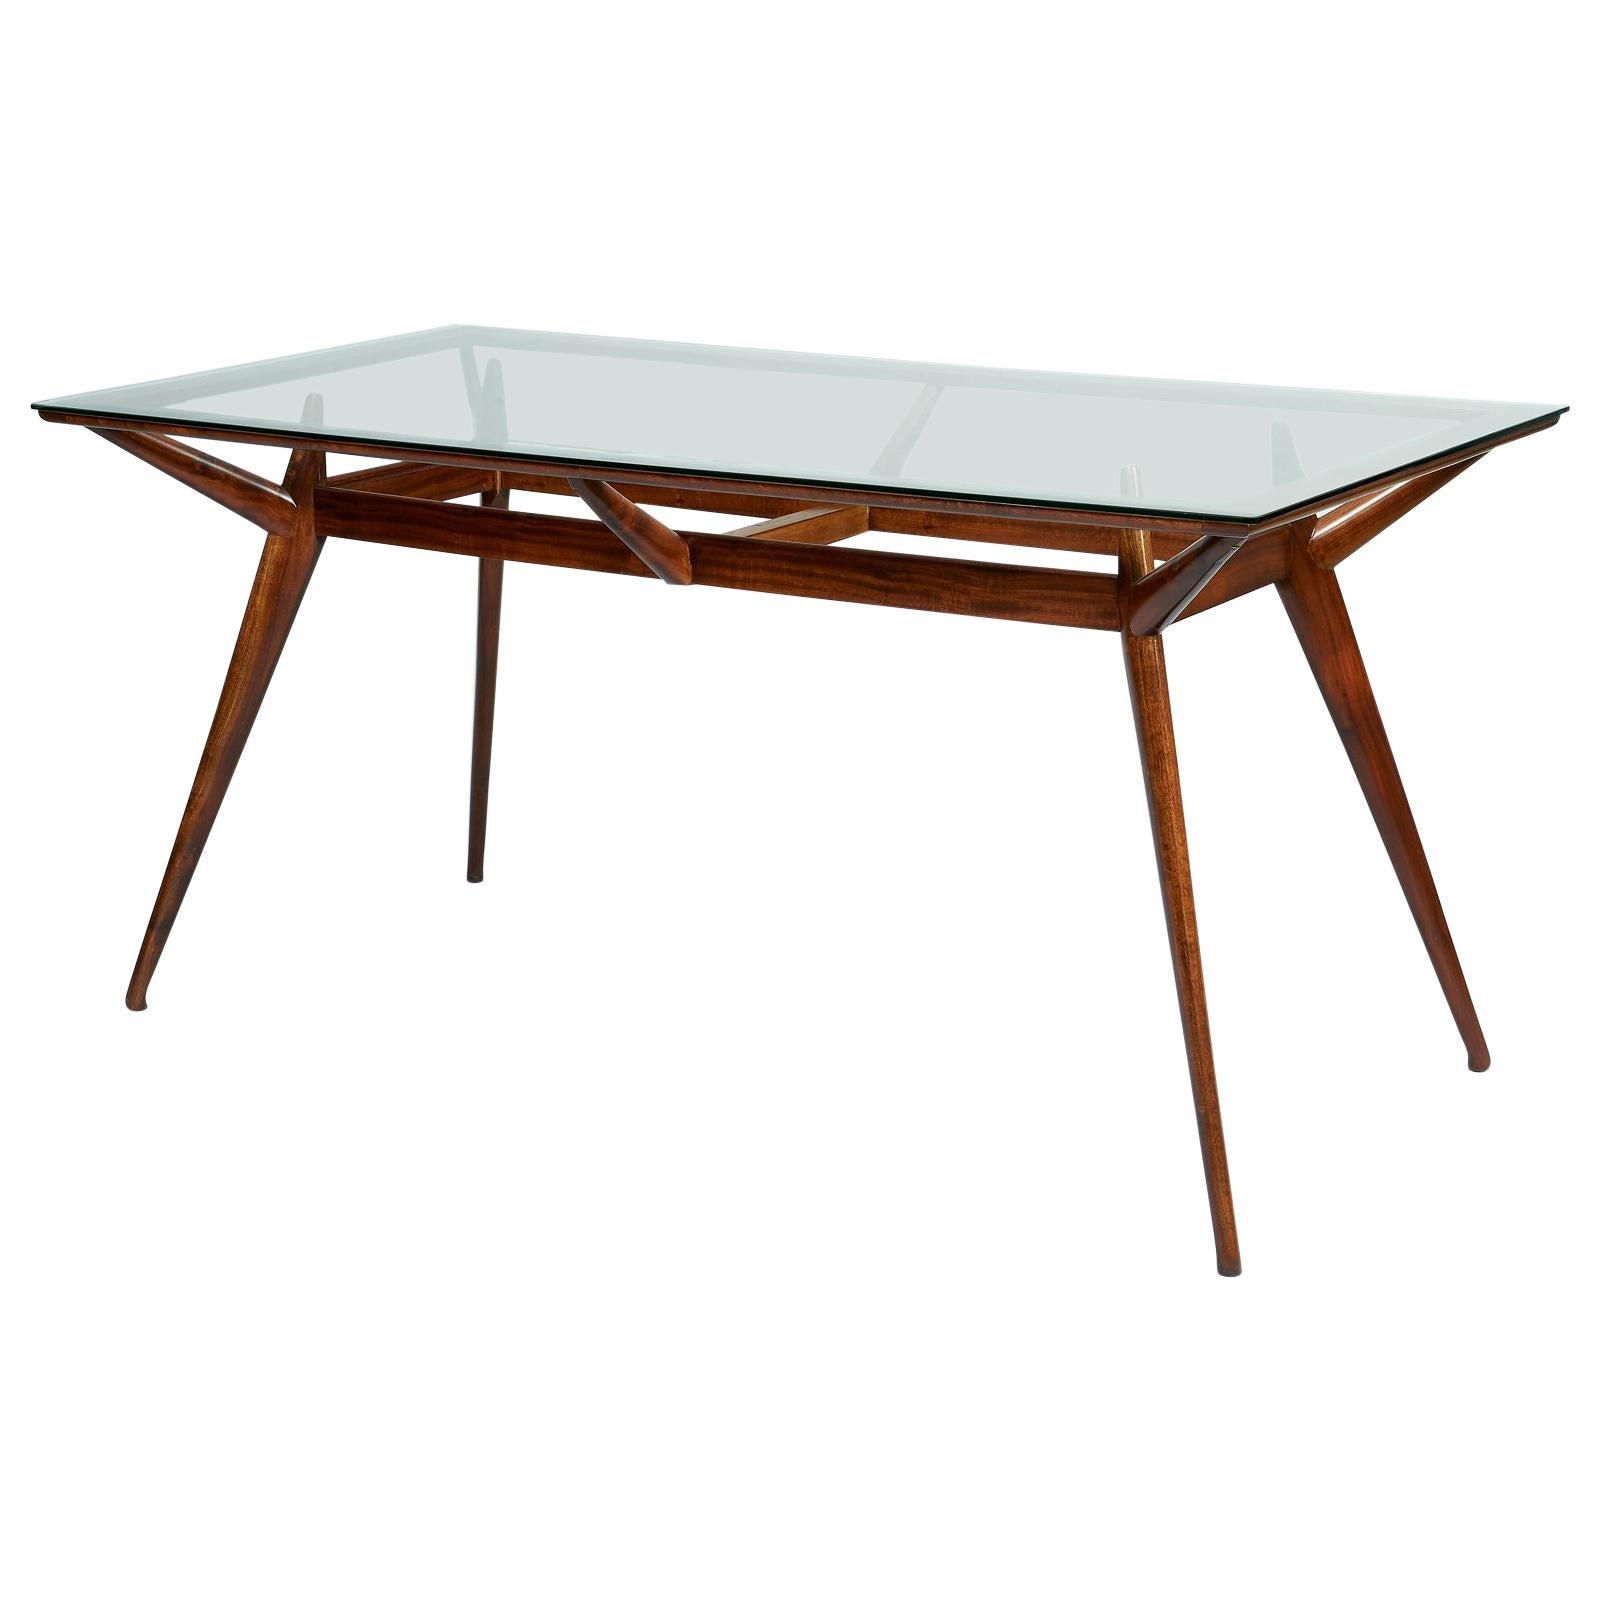 Silvio Cavatorta Organic Modern Mahogany and Glass Dining Table, Italy 1950s